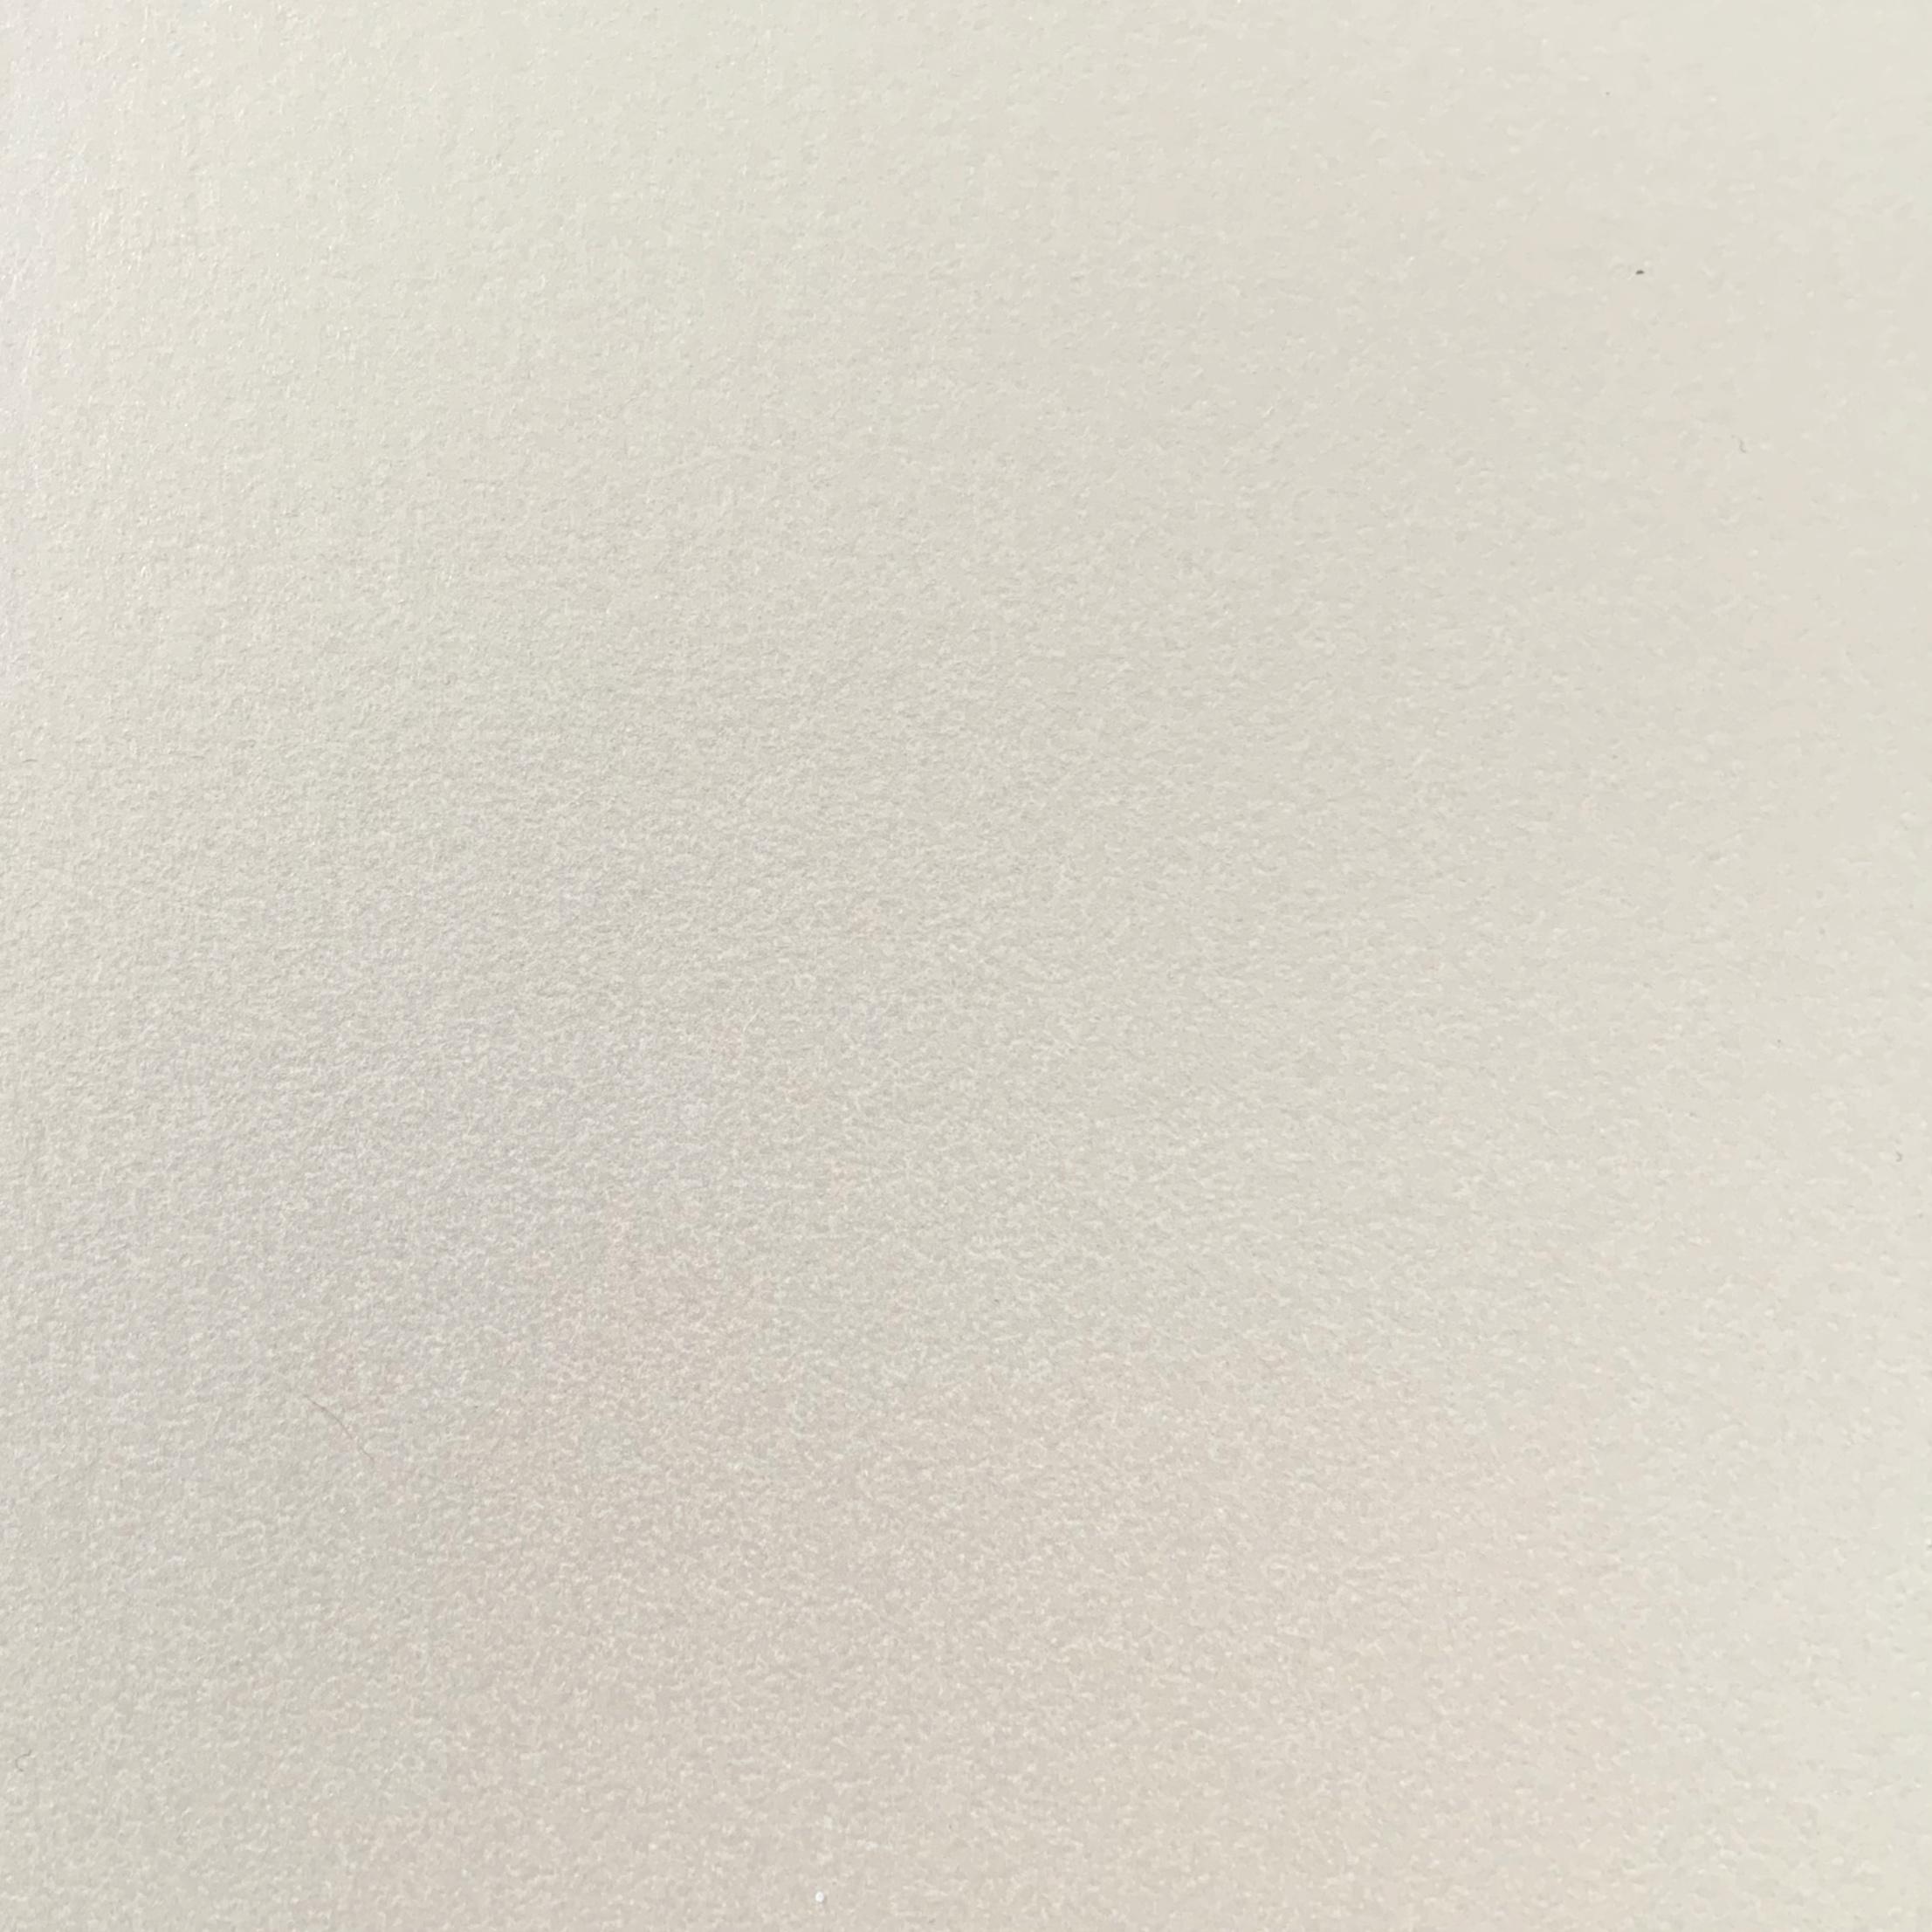 Ivory Pearl Cardstock